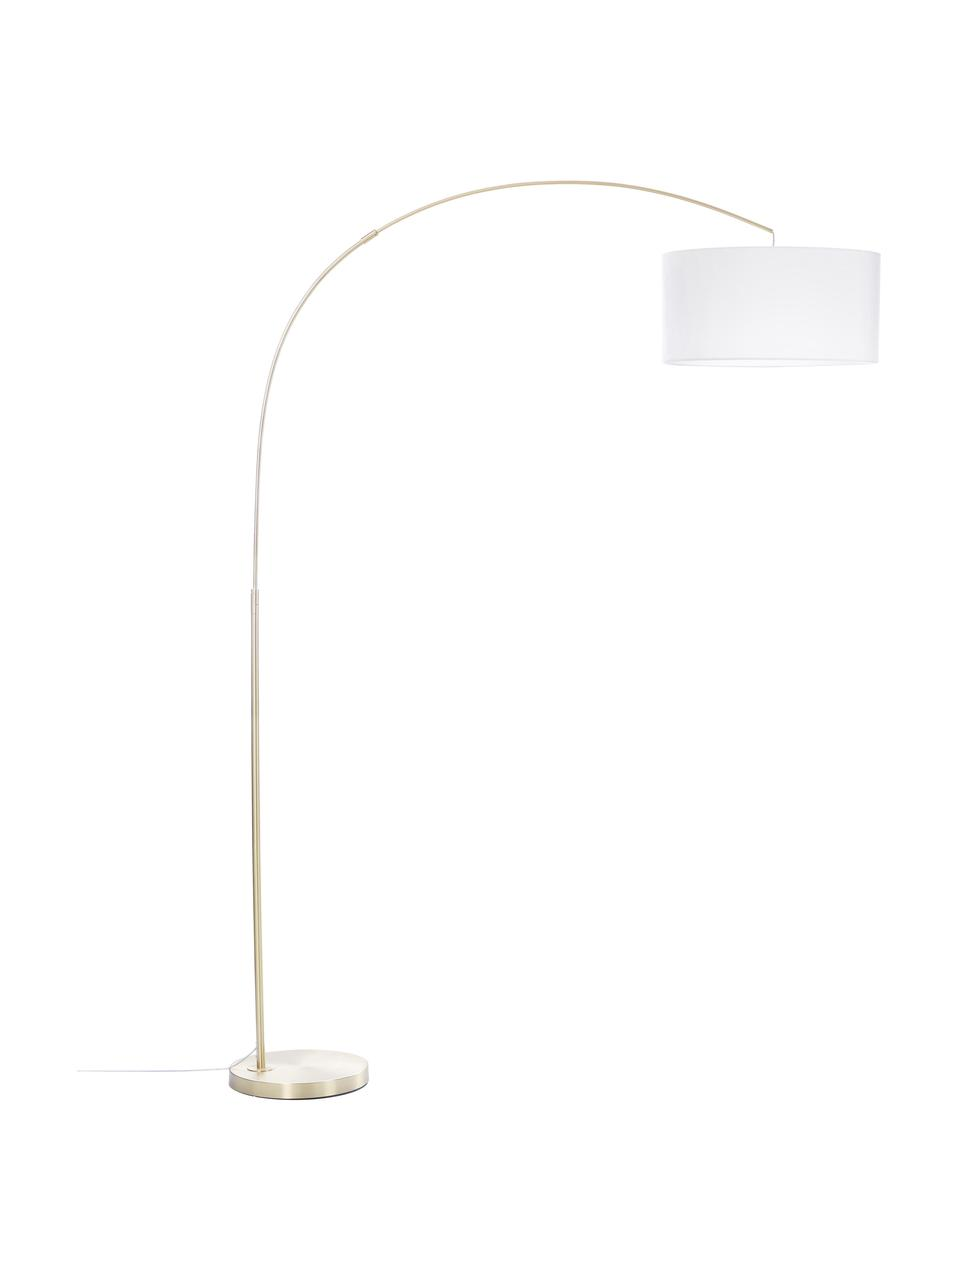 Grote booglamp Niels in messing, Lampenkap: katoenmix, Lampvoet: geborsteld metaal, Lampenkap: wit. Lampvoet: messingkleurig. Snoer: transparant, 157 x 218 cm